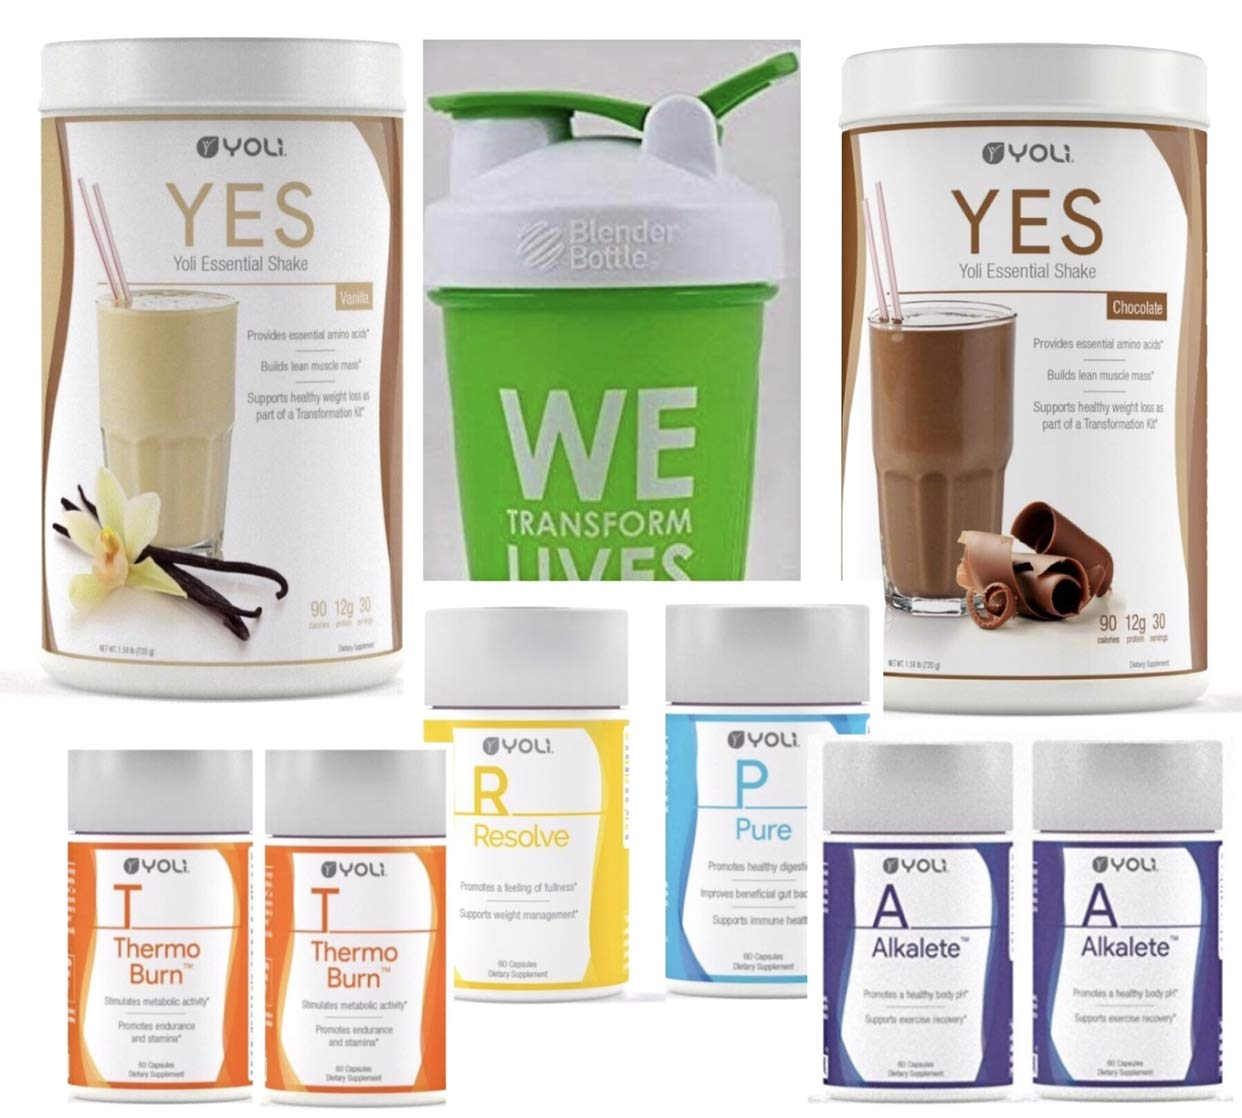 Yoli Weight Loss Kit - Thermo Burn Alkalete Pure